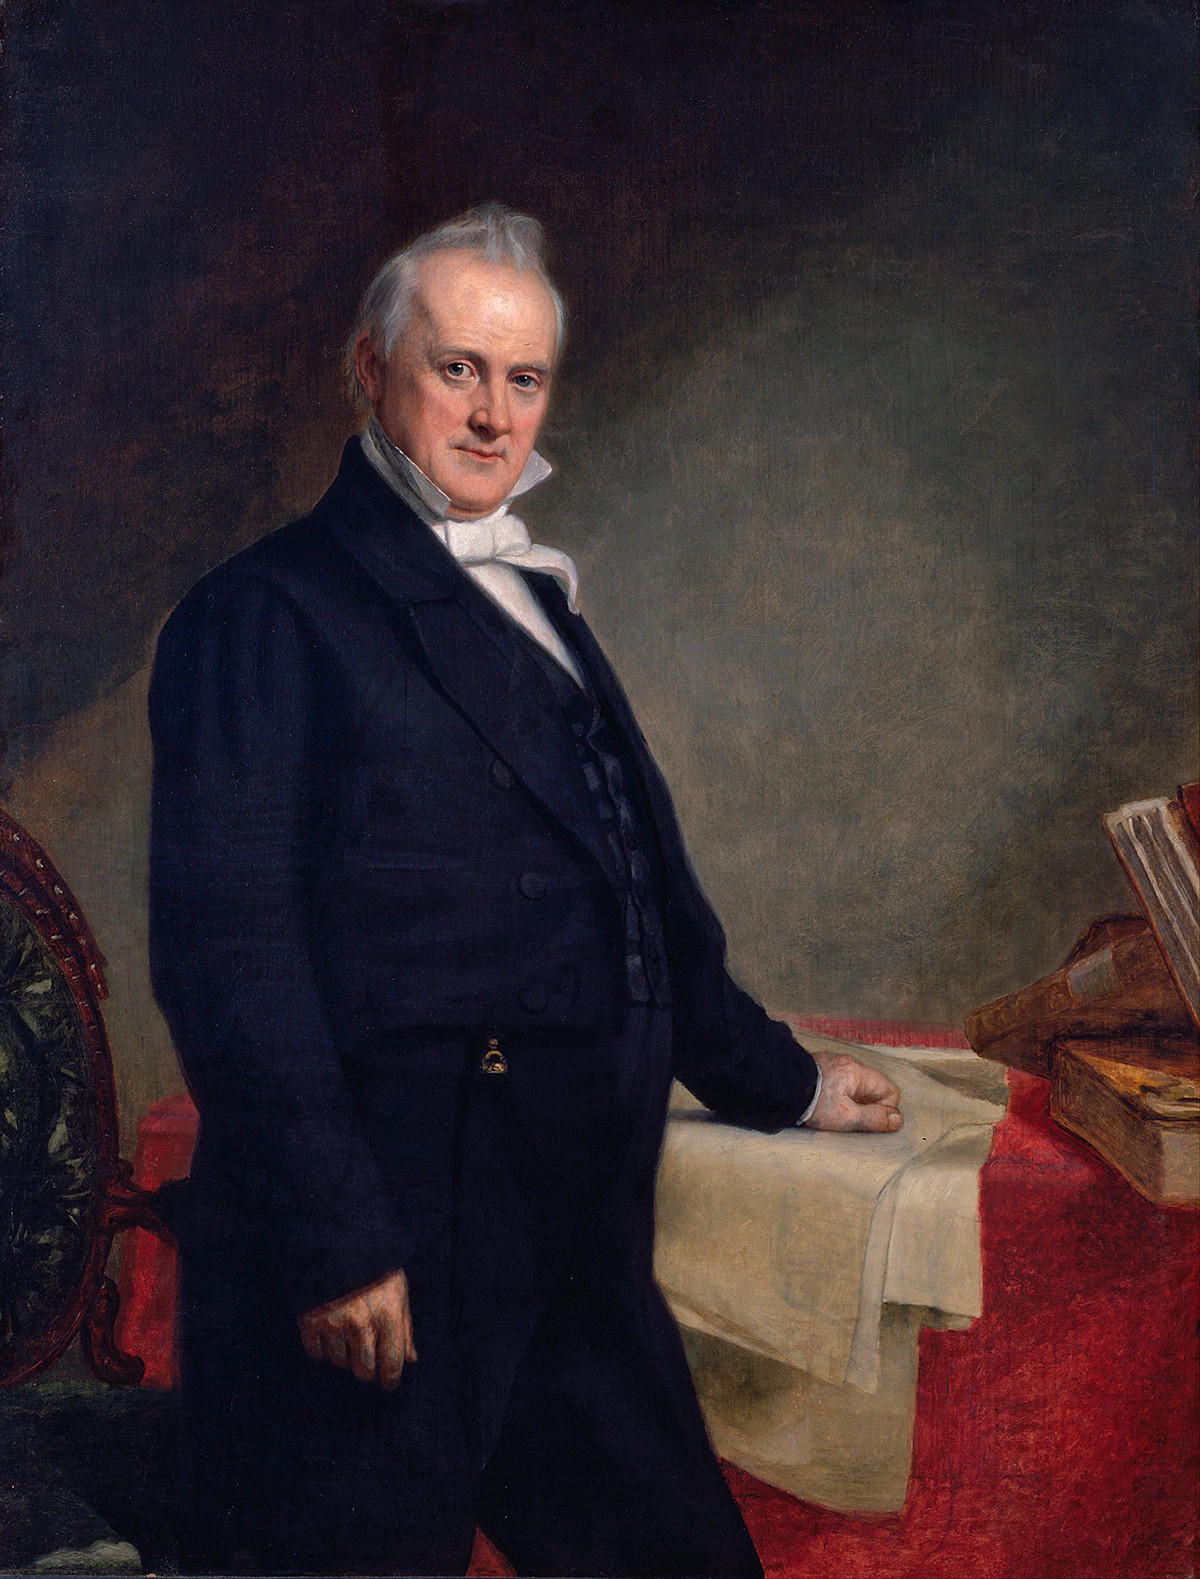 Portrait of James Buchanan by George Peter Alexander Healy